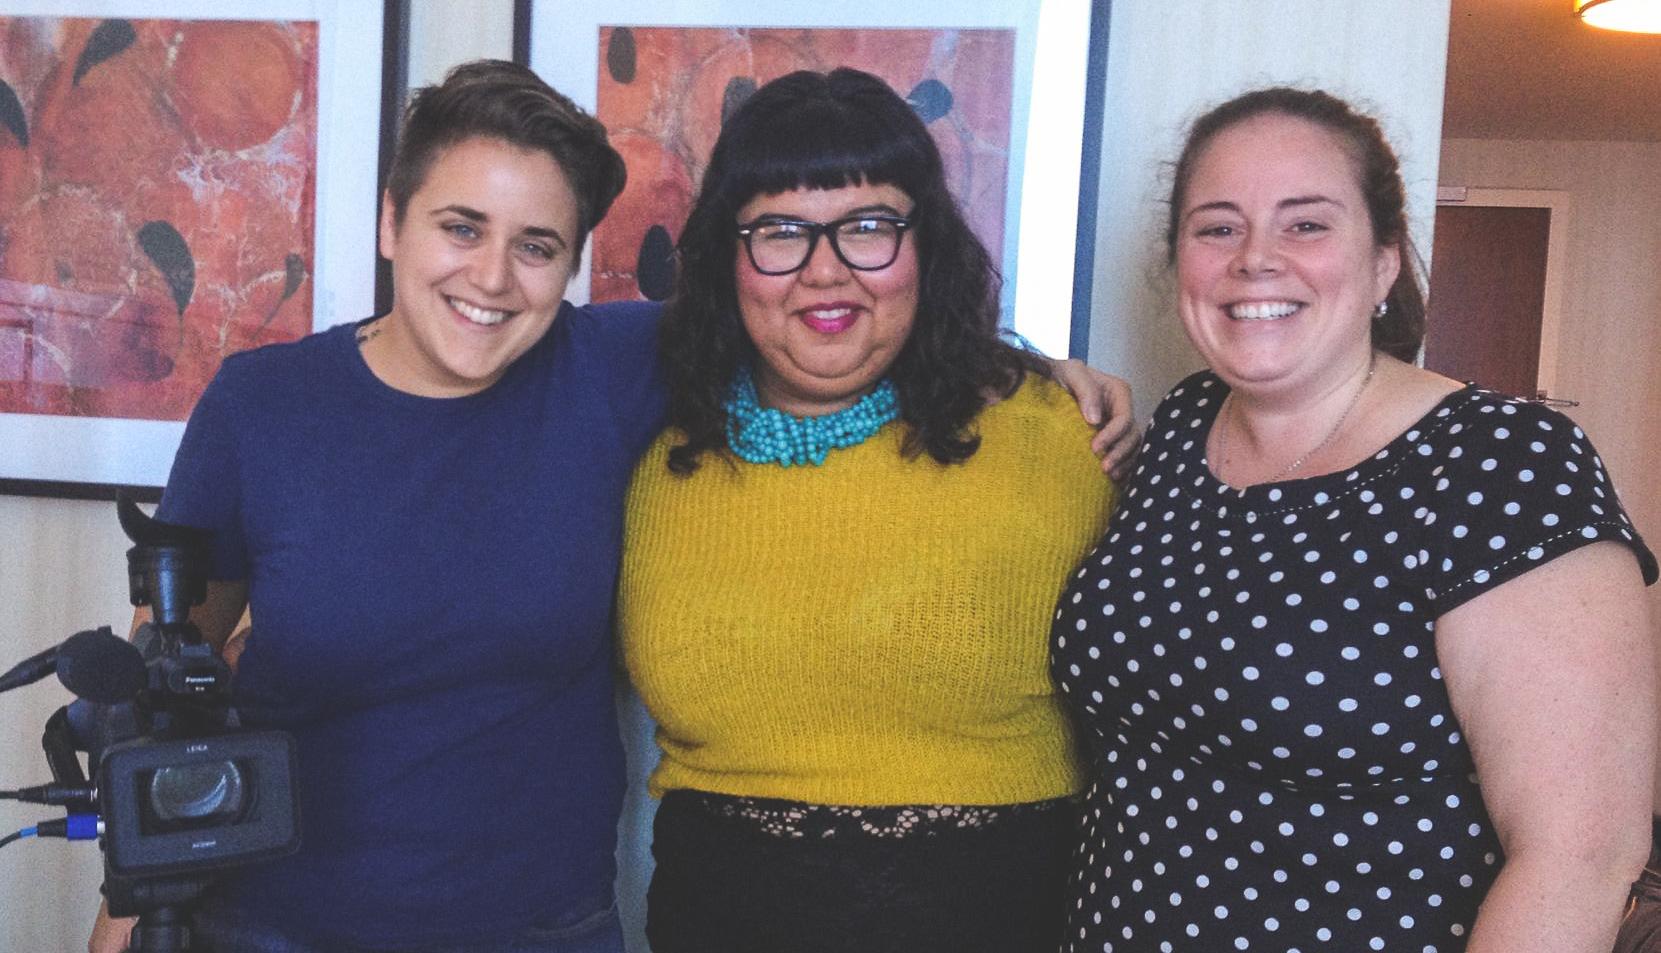 Fattitude And Motherhood With Filmmaker Lindsey Averill